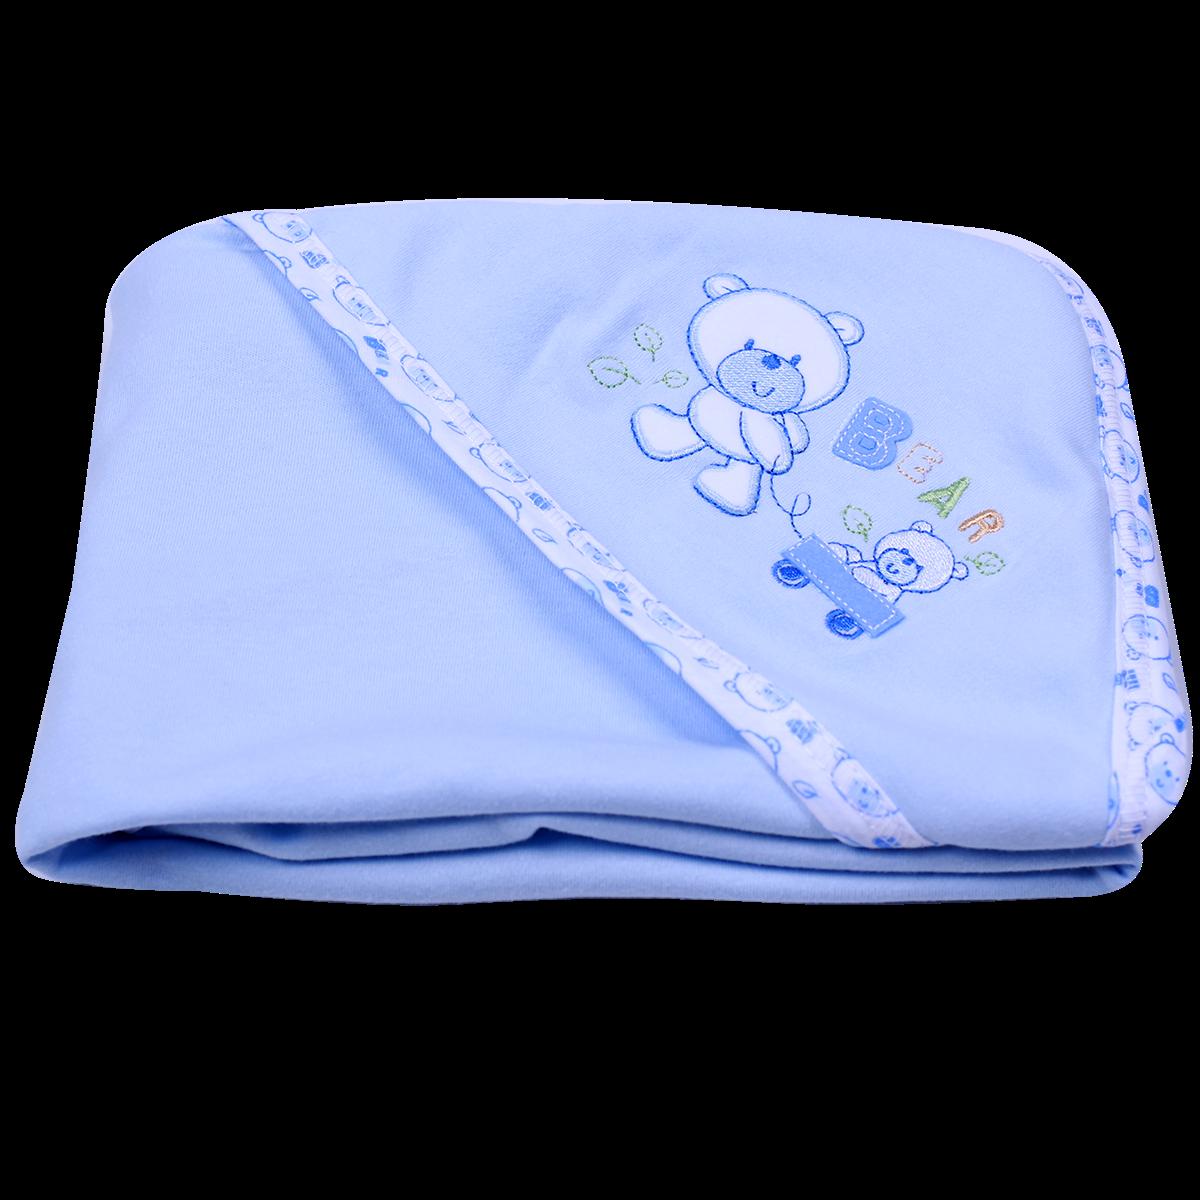 Chăn mũ Comfort cotton